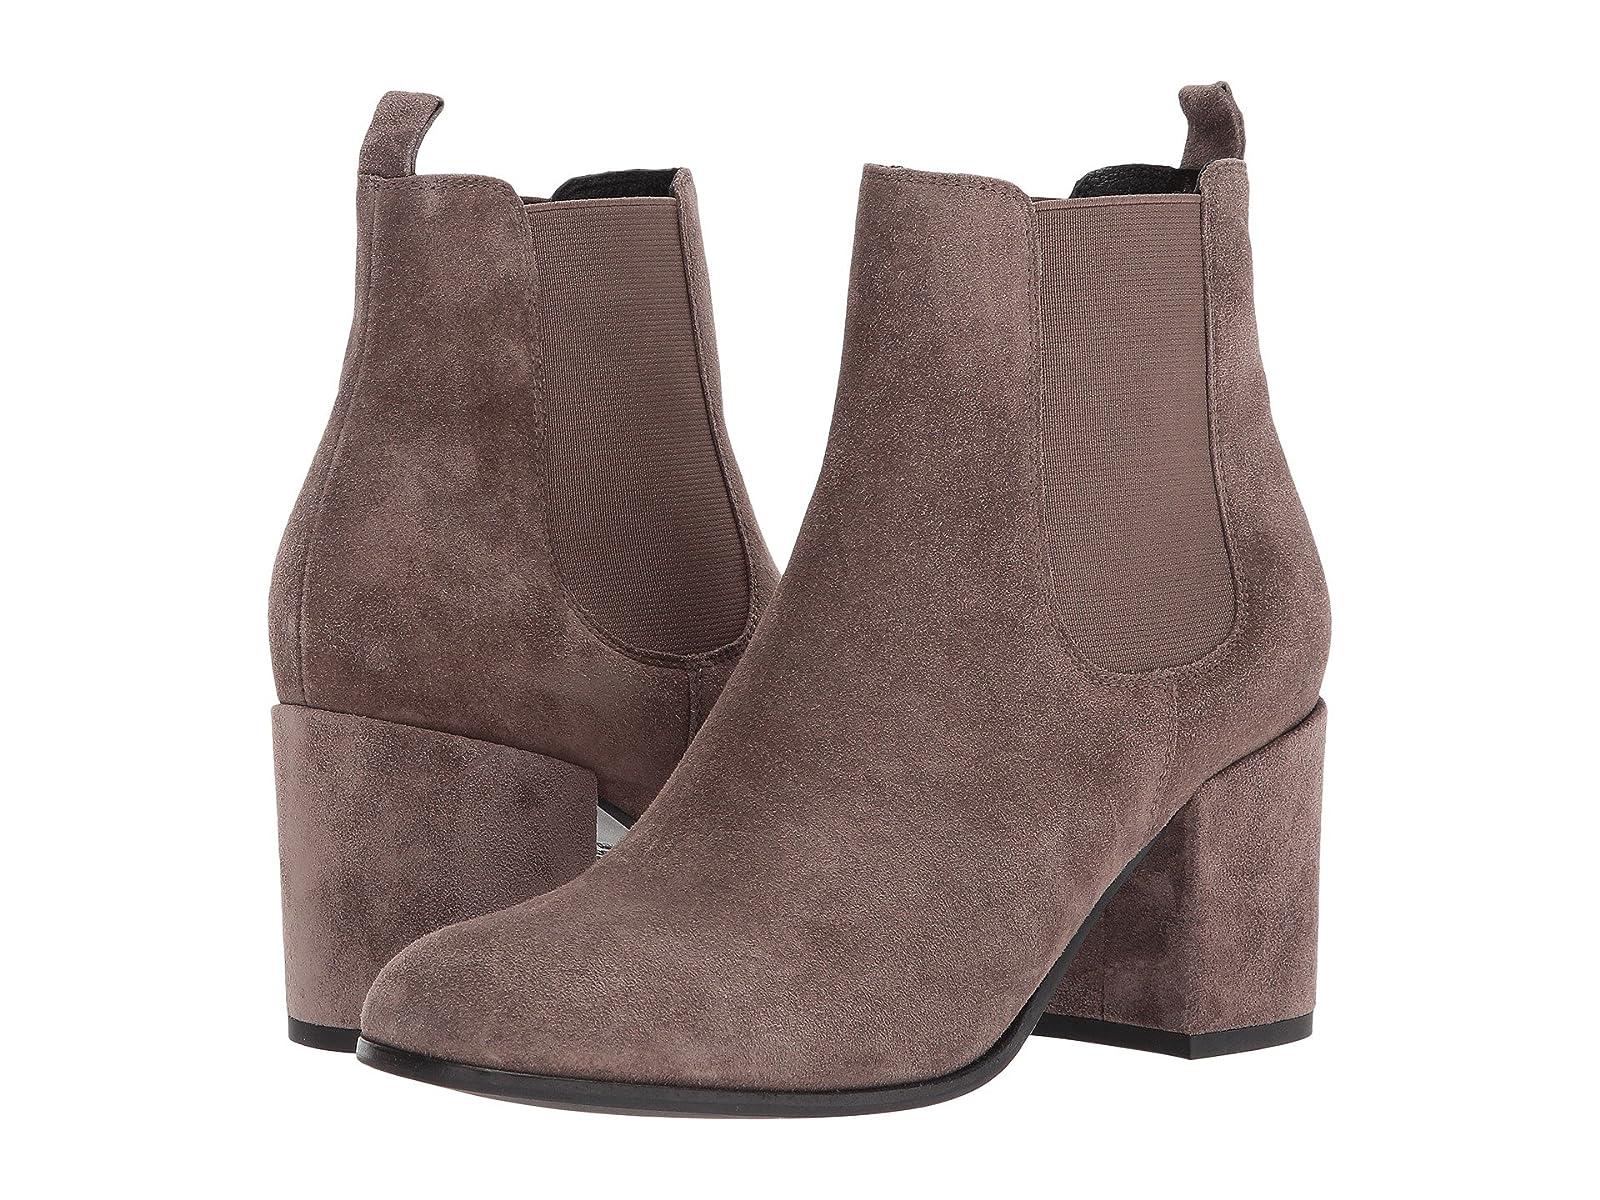 Kennel & Schmenger Kiko Chelsea BootCheap and distinctive eye-catching shoes